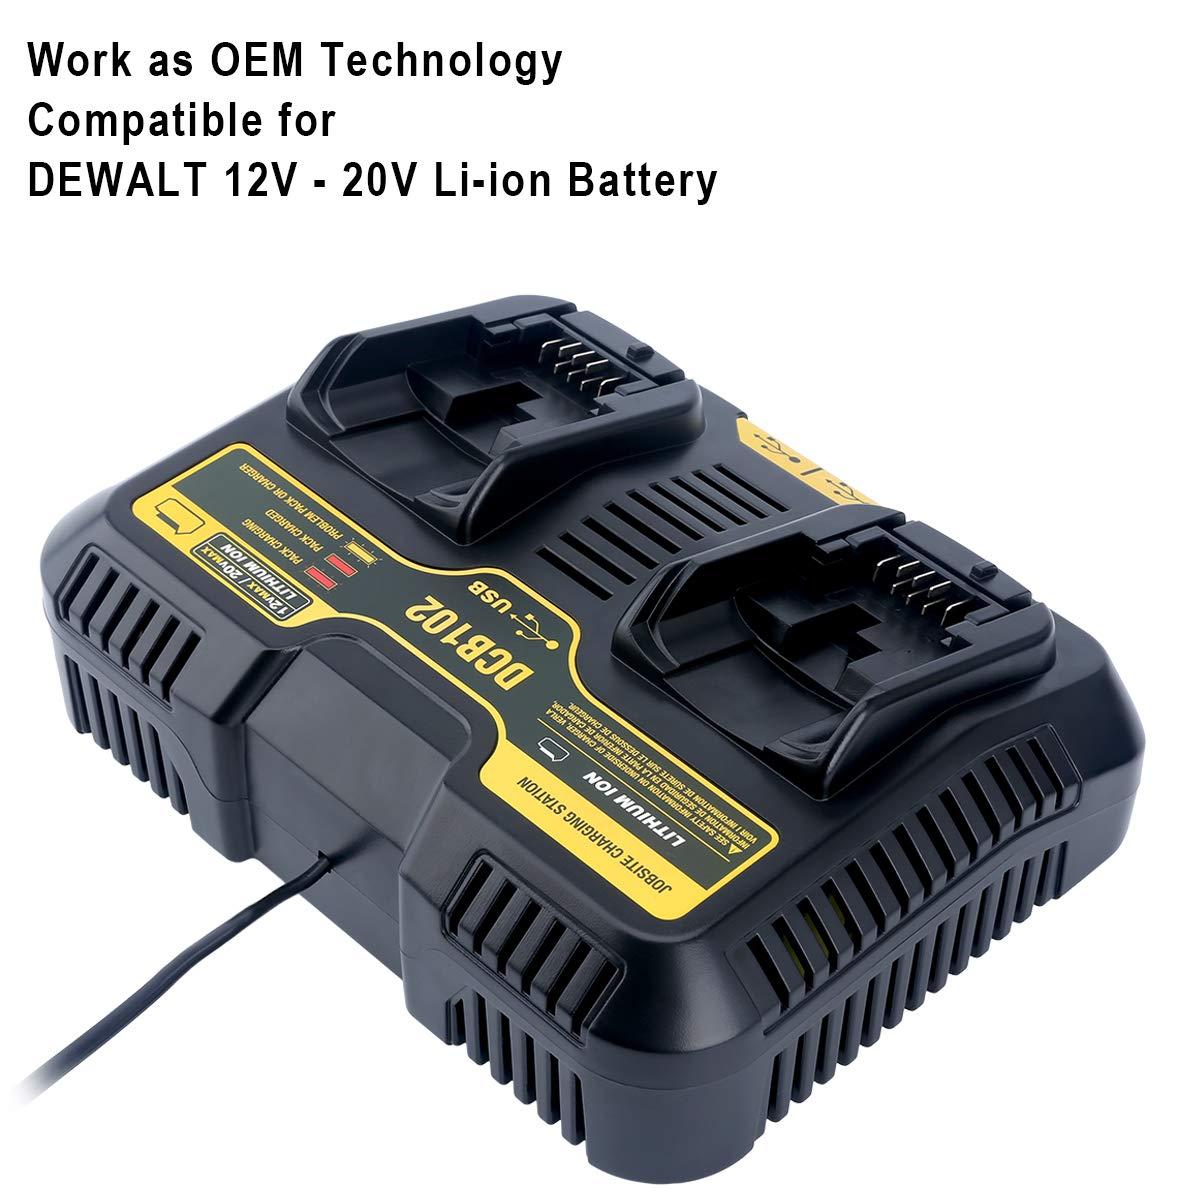 Elefly DCB102BP 2-Port Replacement Battery Charger for DEWALT 12V - 20V MAX Jobsite Charging Station DCB102 DCB102BP Dewalt Lithium Battery DCB205-2 ...